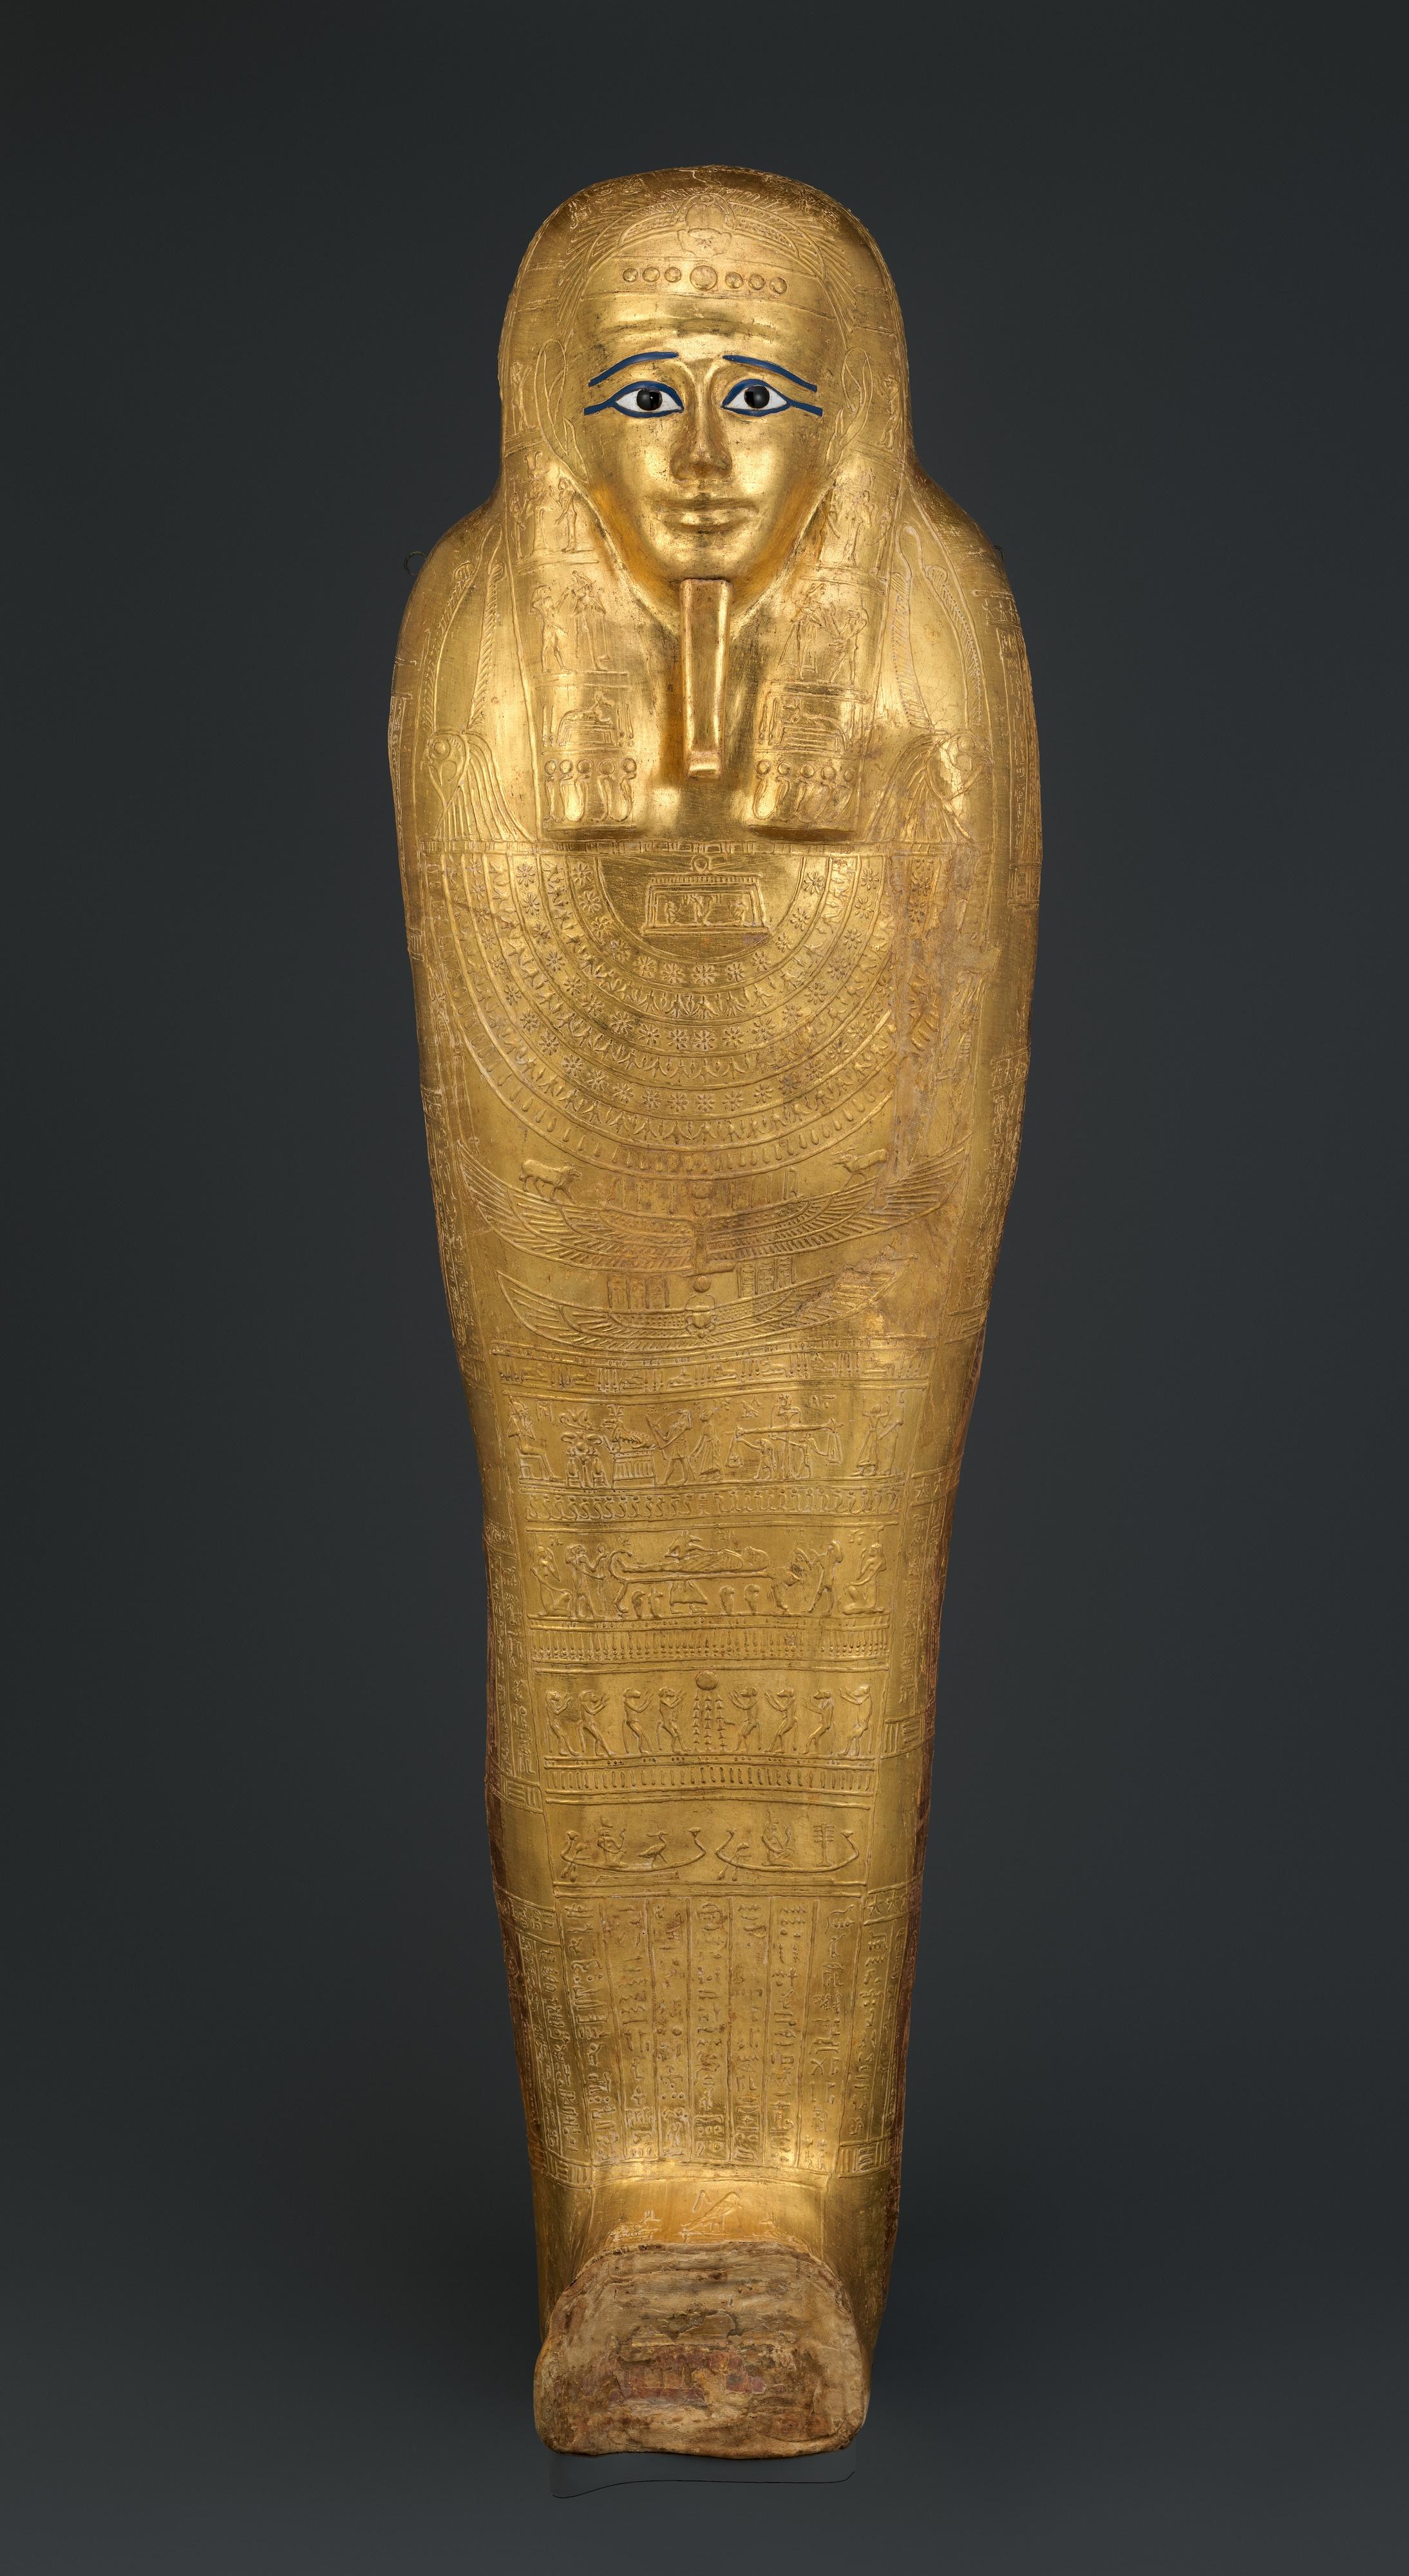 https://upload.wikimedia.org/wikipedia/commons/e/e1/Lid_of_the_coffin_of_the_priest_of_Heryshef%2C_Nedjemankh_MET_DP-14049-01.jpg